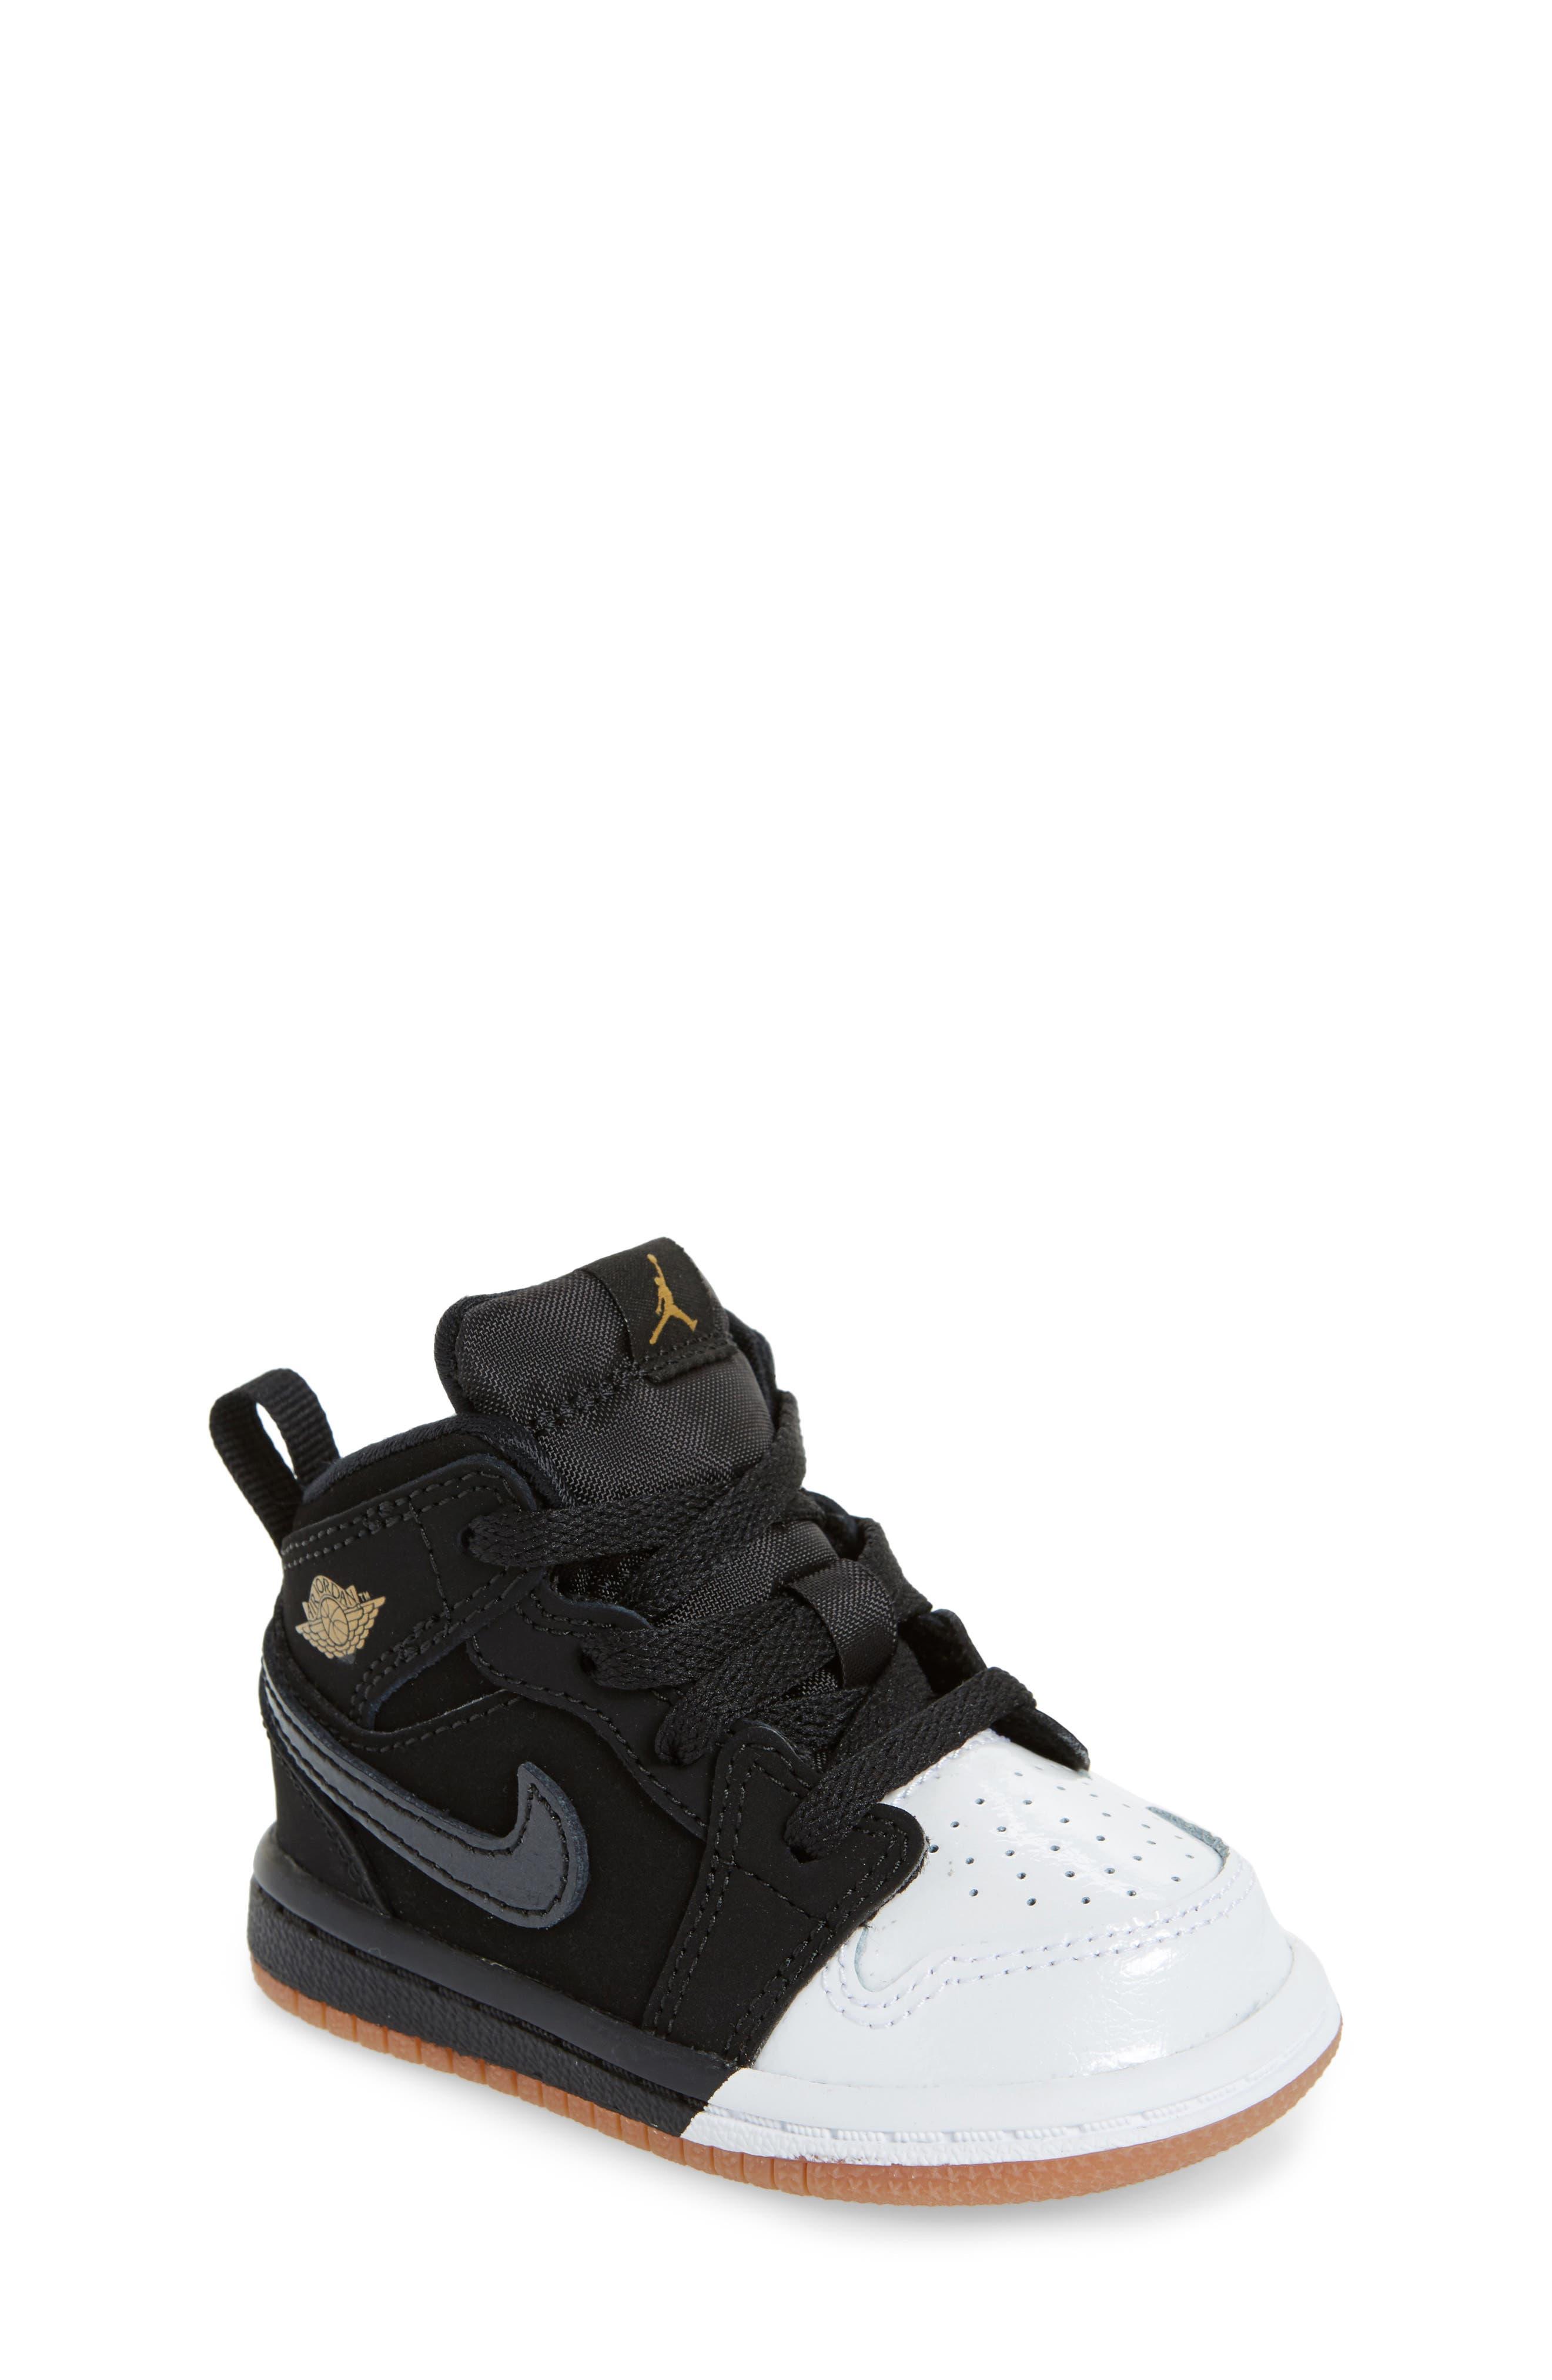 Main Image - Nike 'Jordan 1 Mid' Basketball Shoe (Walker)